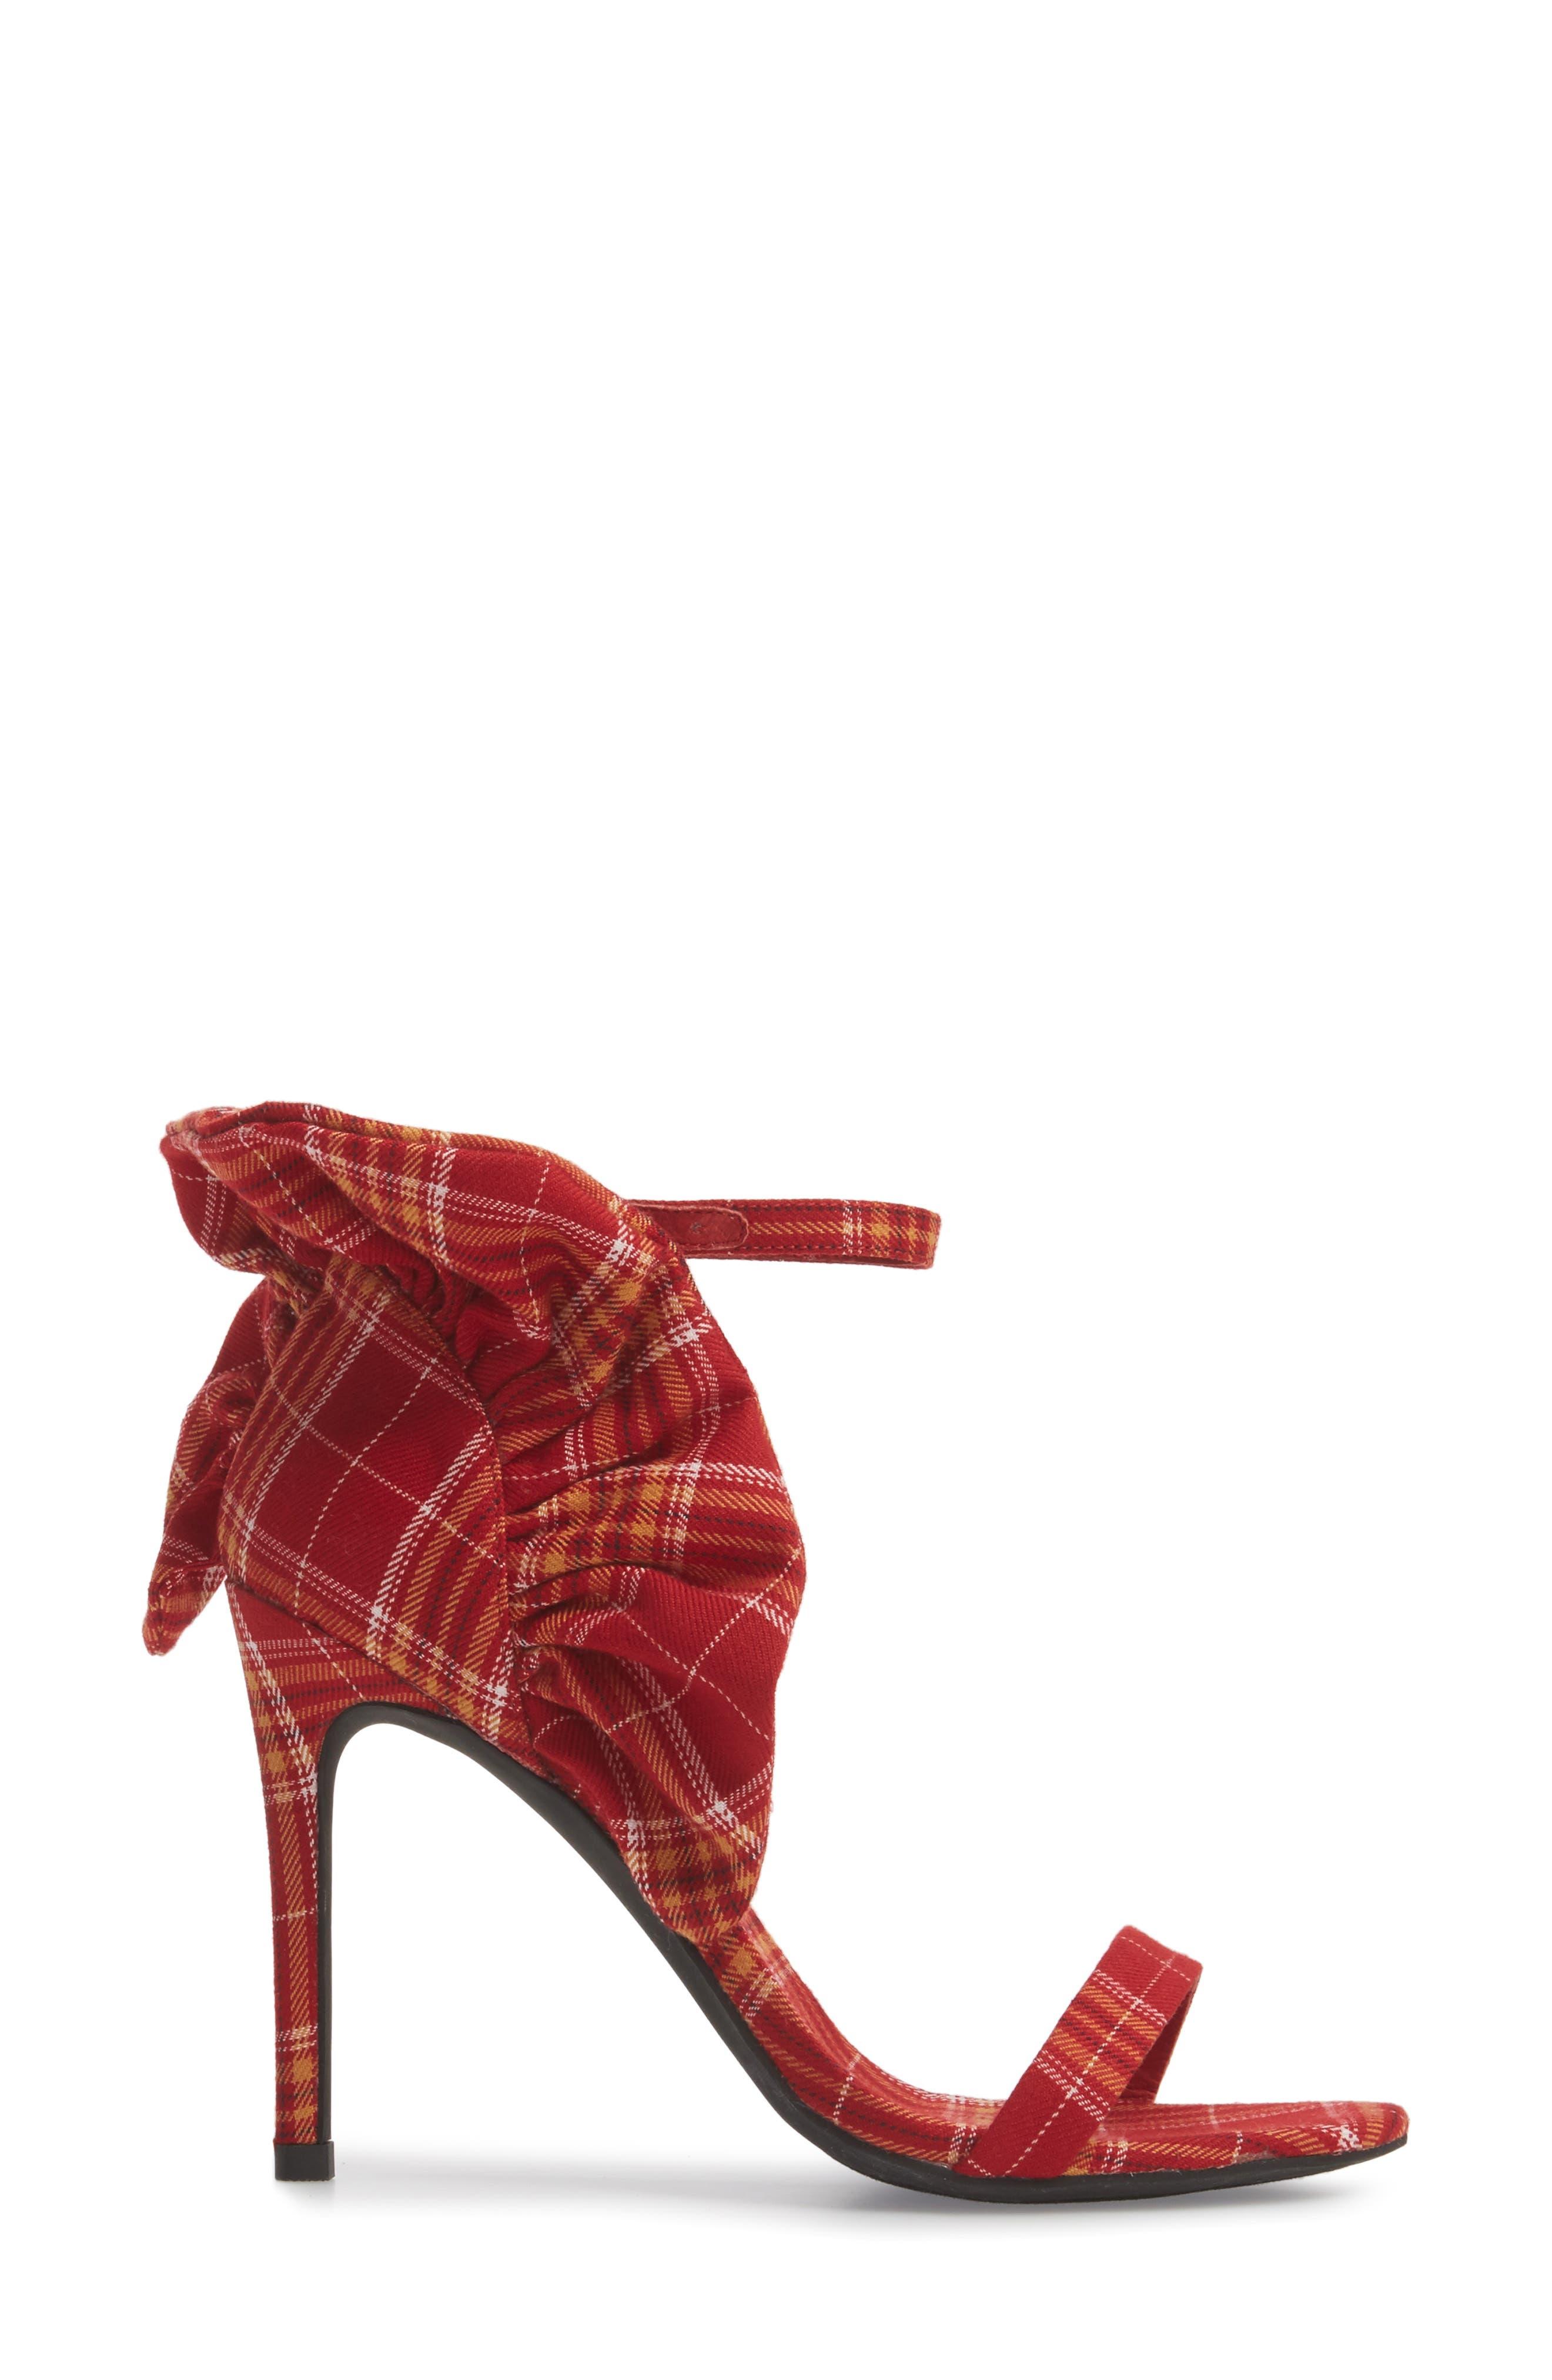 Cheshire Ruffle Sandal,                             Alternate thumbnail 3, color,                             Red Plaid Fabric